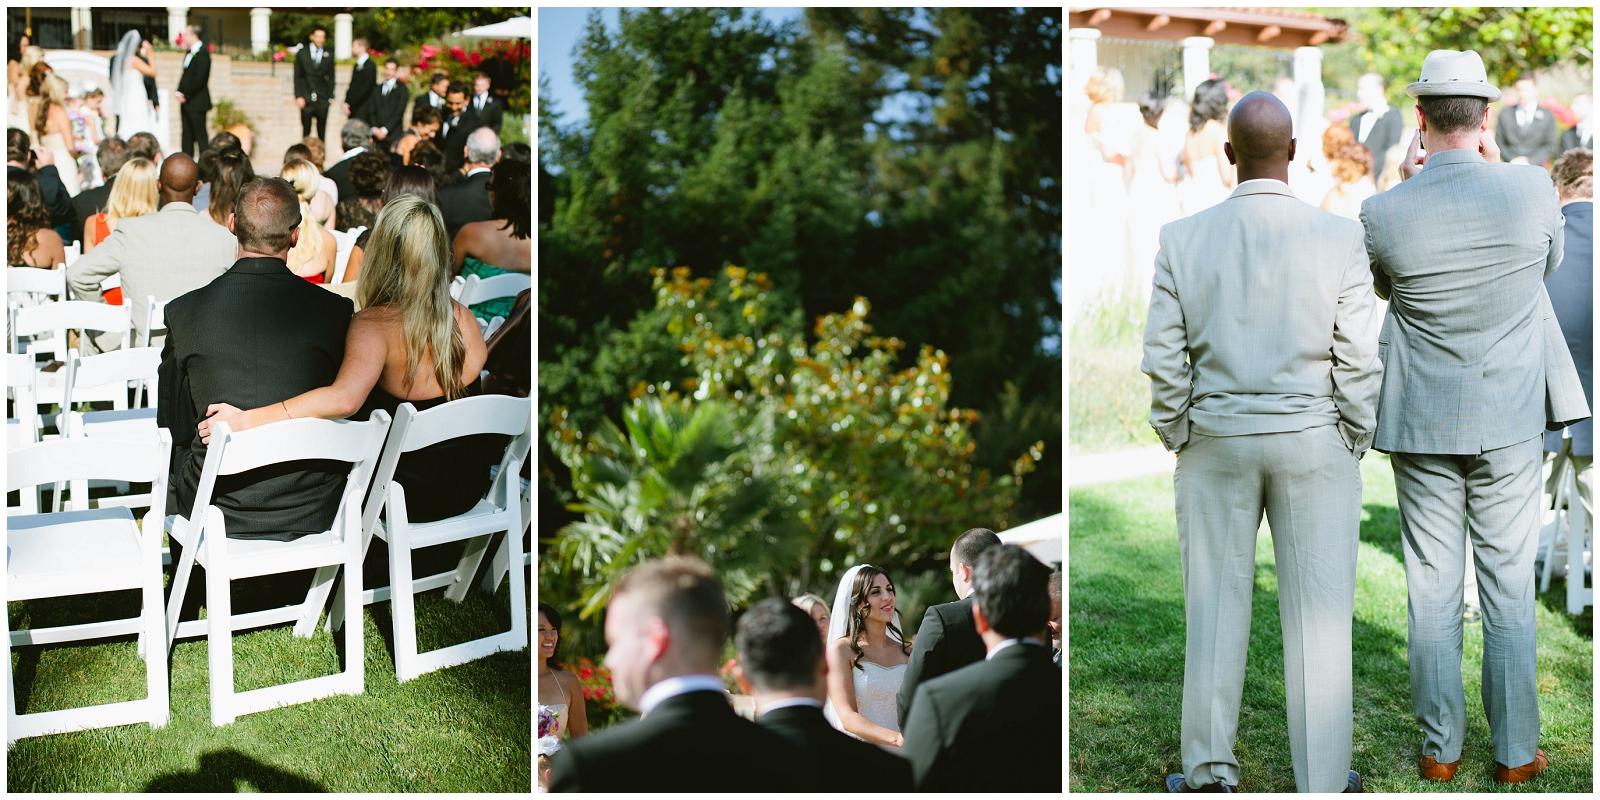 San-Francisco-Bay-Area-Wedding-Photography-Kennolyn-7.jpg